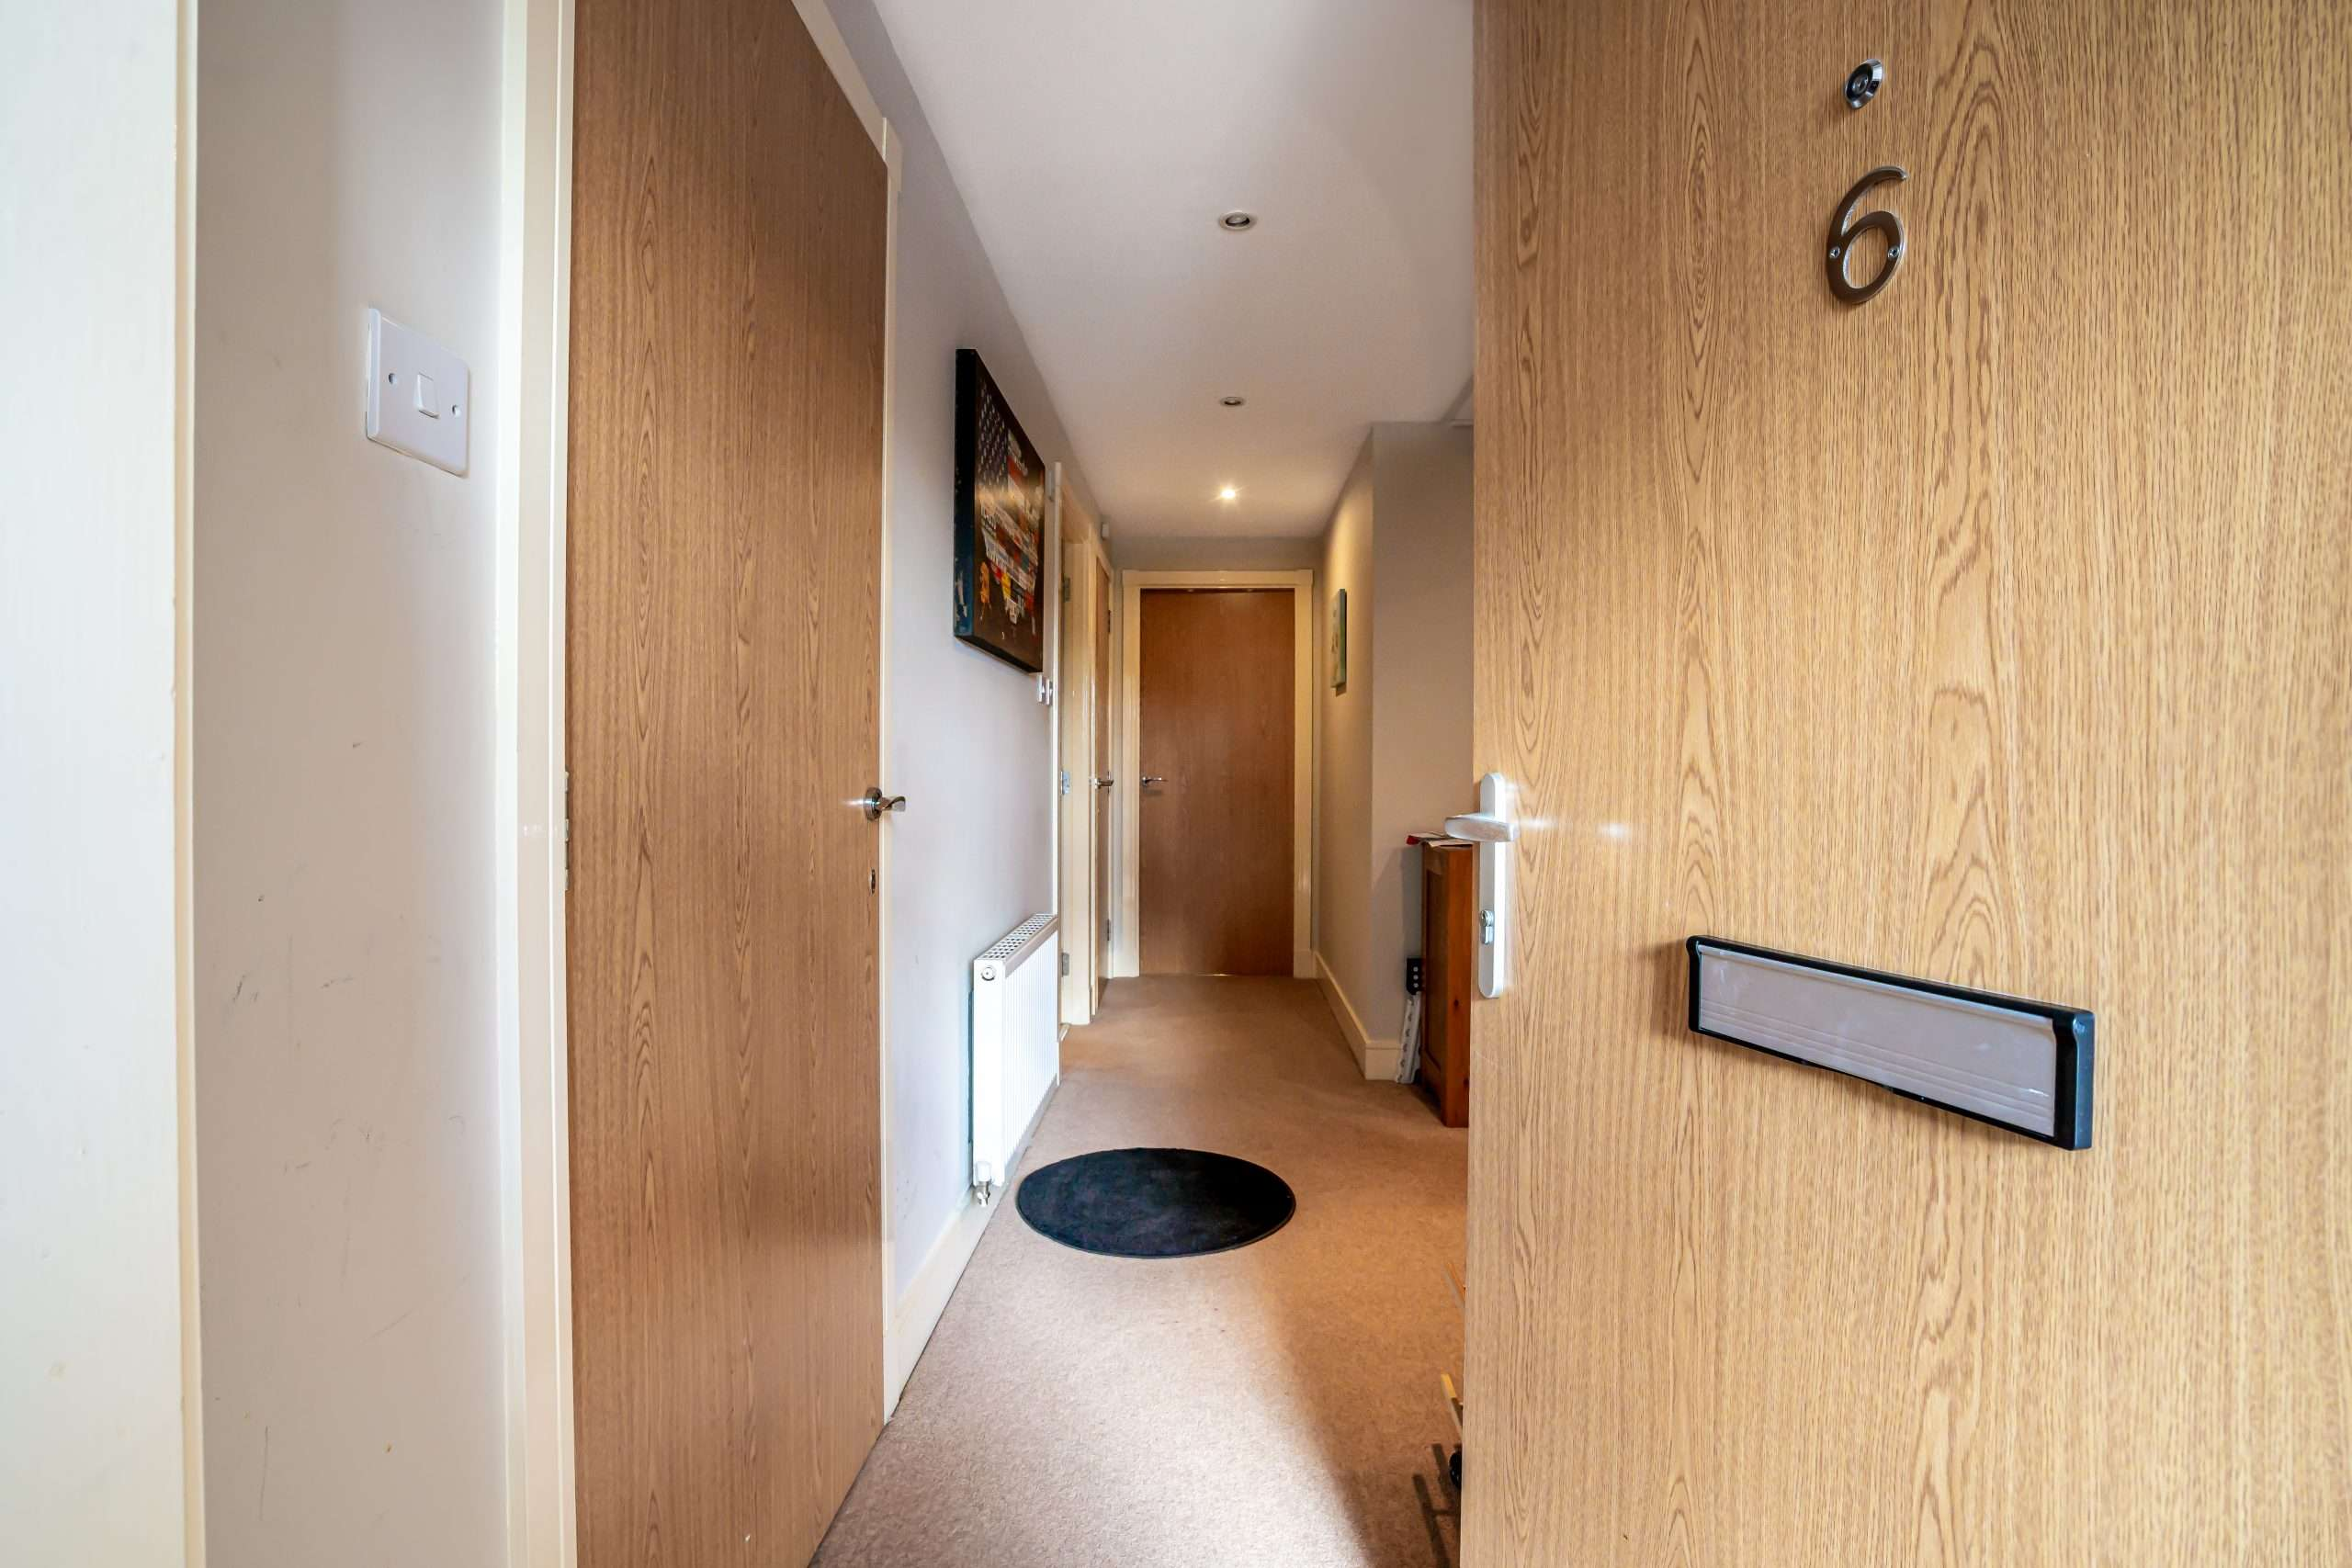 14 Pinkhill Park, Edinburgh – 2 Bed Apartment